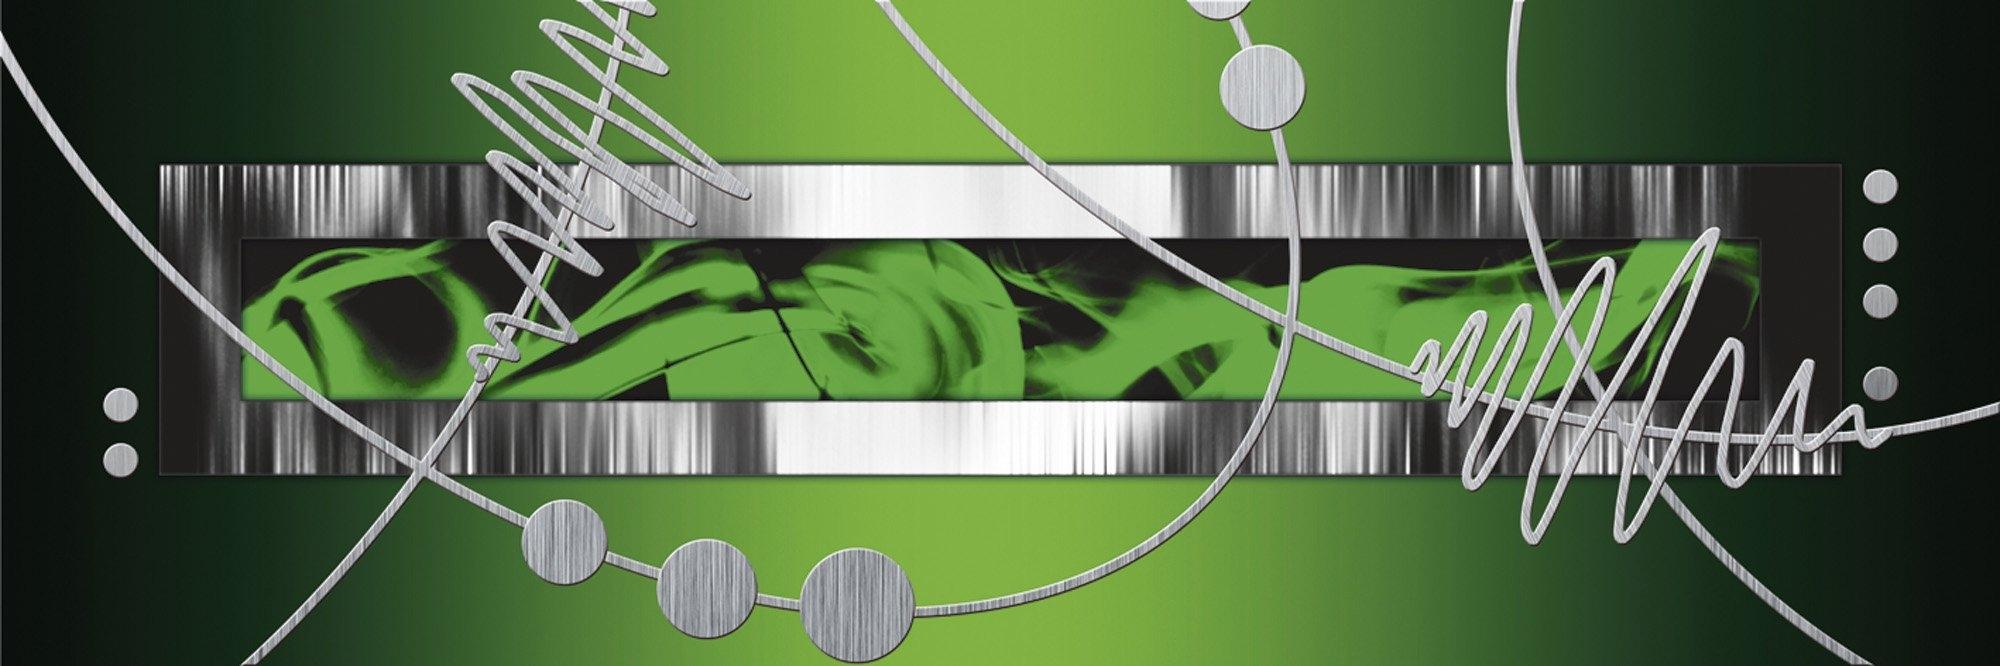 Home affaire artprint op linnen Jule: Zilver abstract op groen 120/40 cm - verschillende betaalmethodes